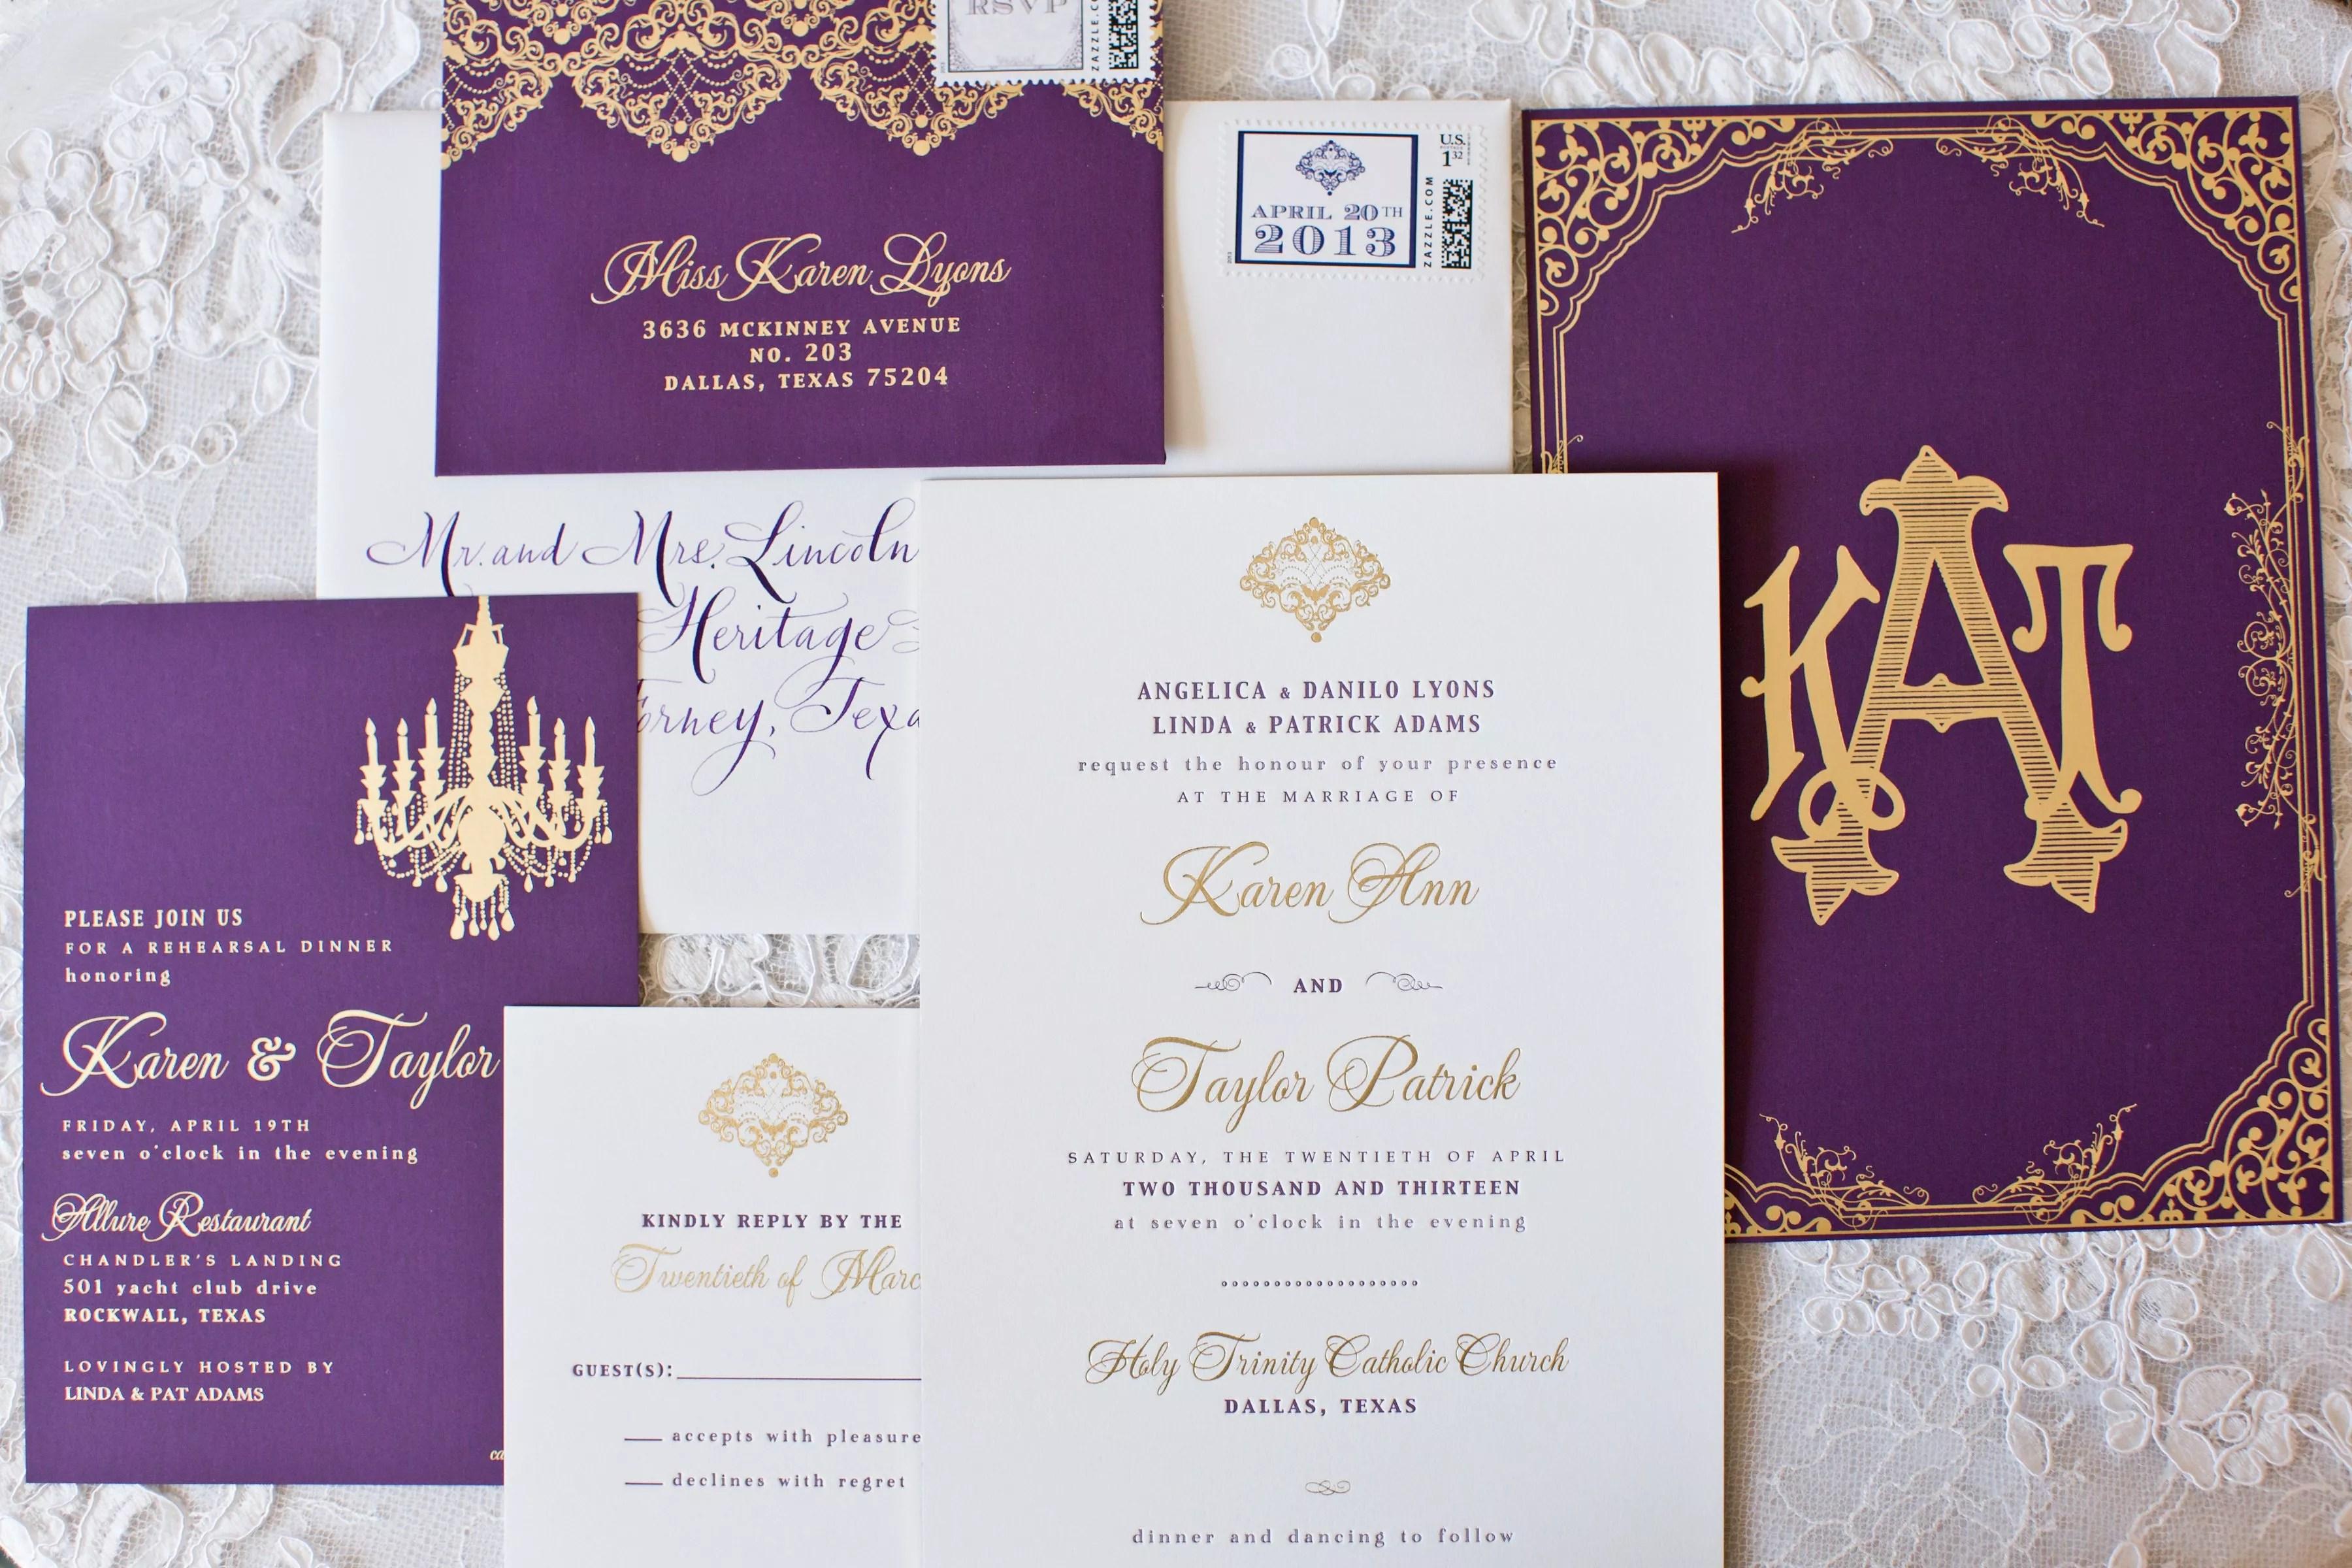 chic purple and gold wedding invitation photo purple and gold wedding